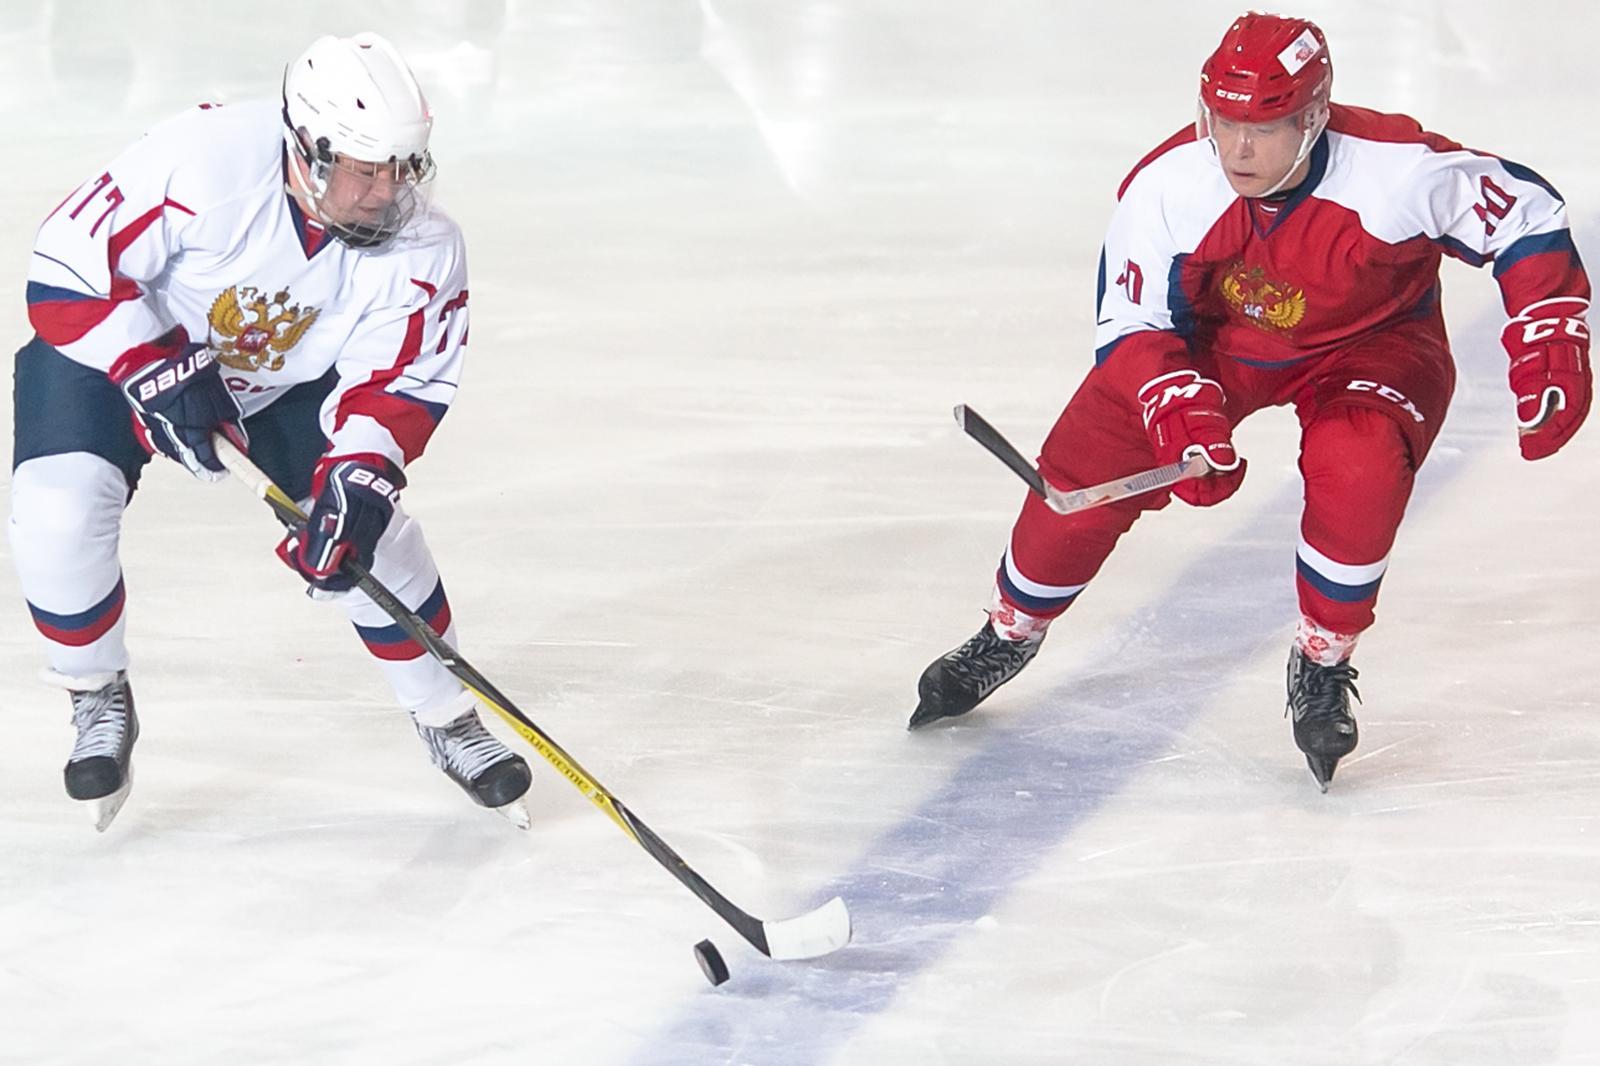 Хоккей 3 Января 2020 Легенды Хоккея v Ночная Хоккейная Лига Роза Хутор Сочи